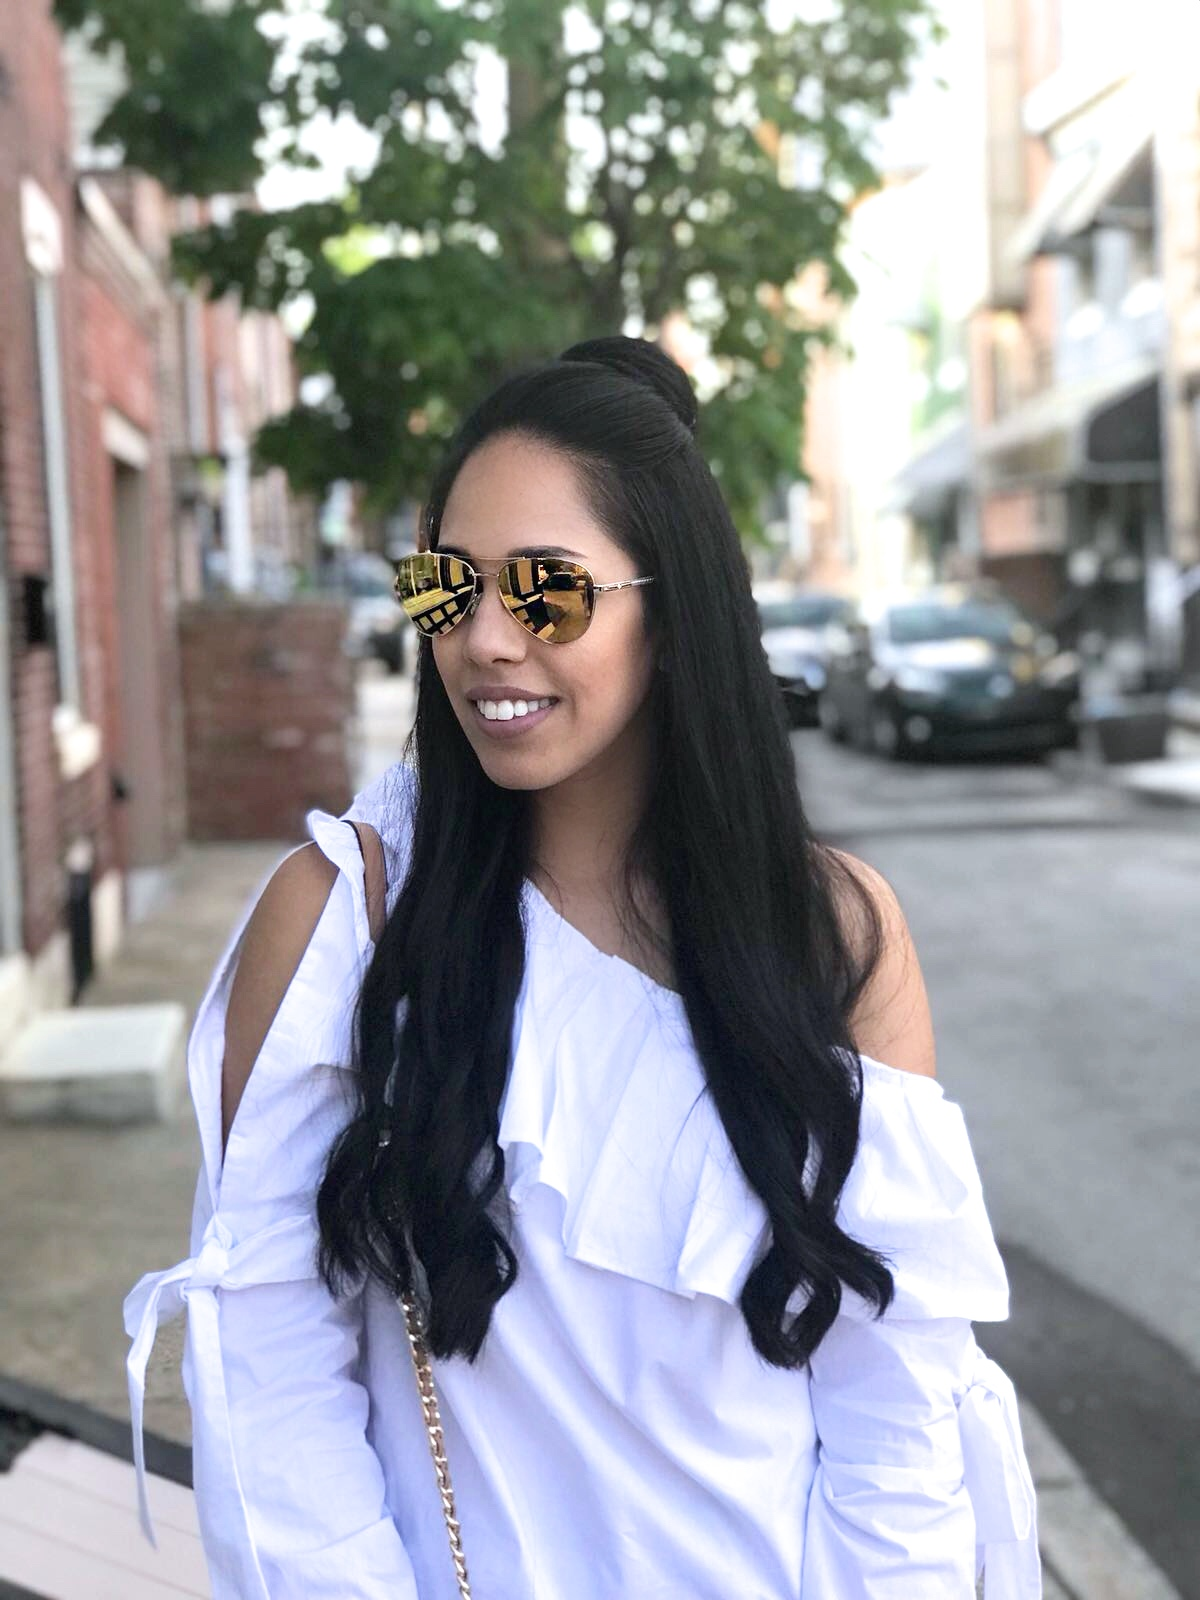 fashion-blogger-affordable-white-ruffle-top.JPG